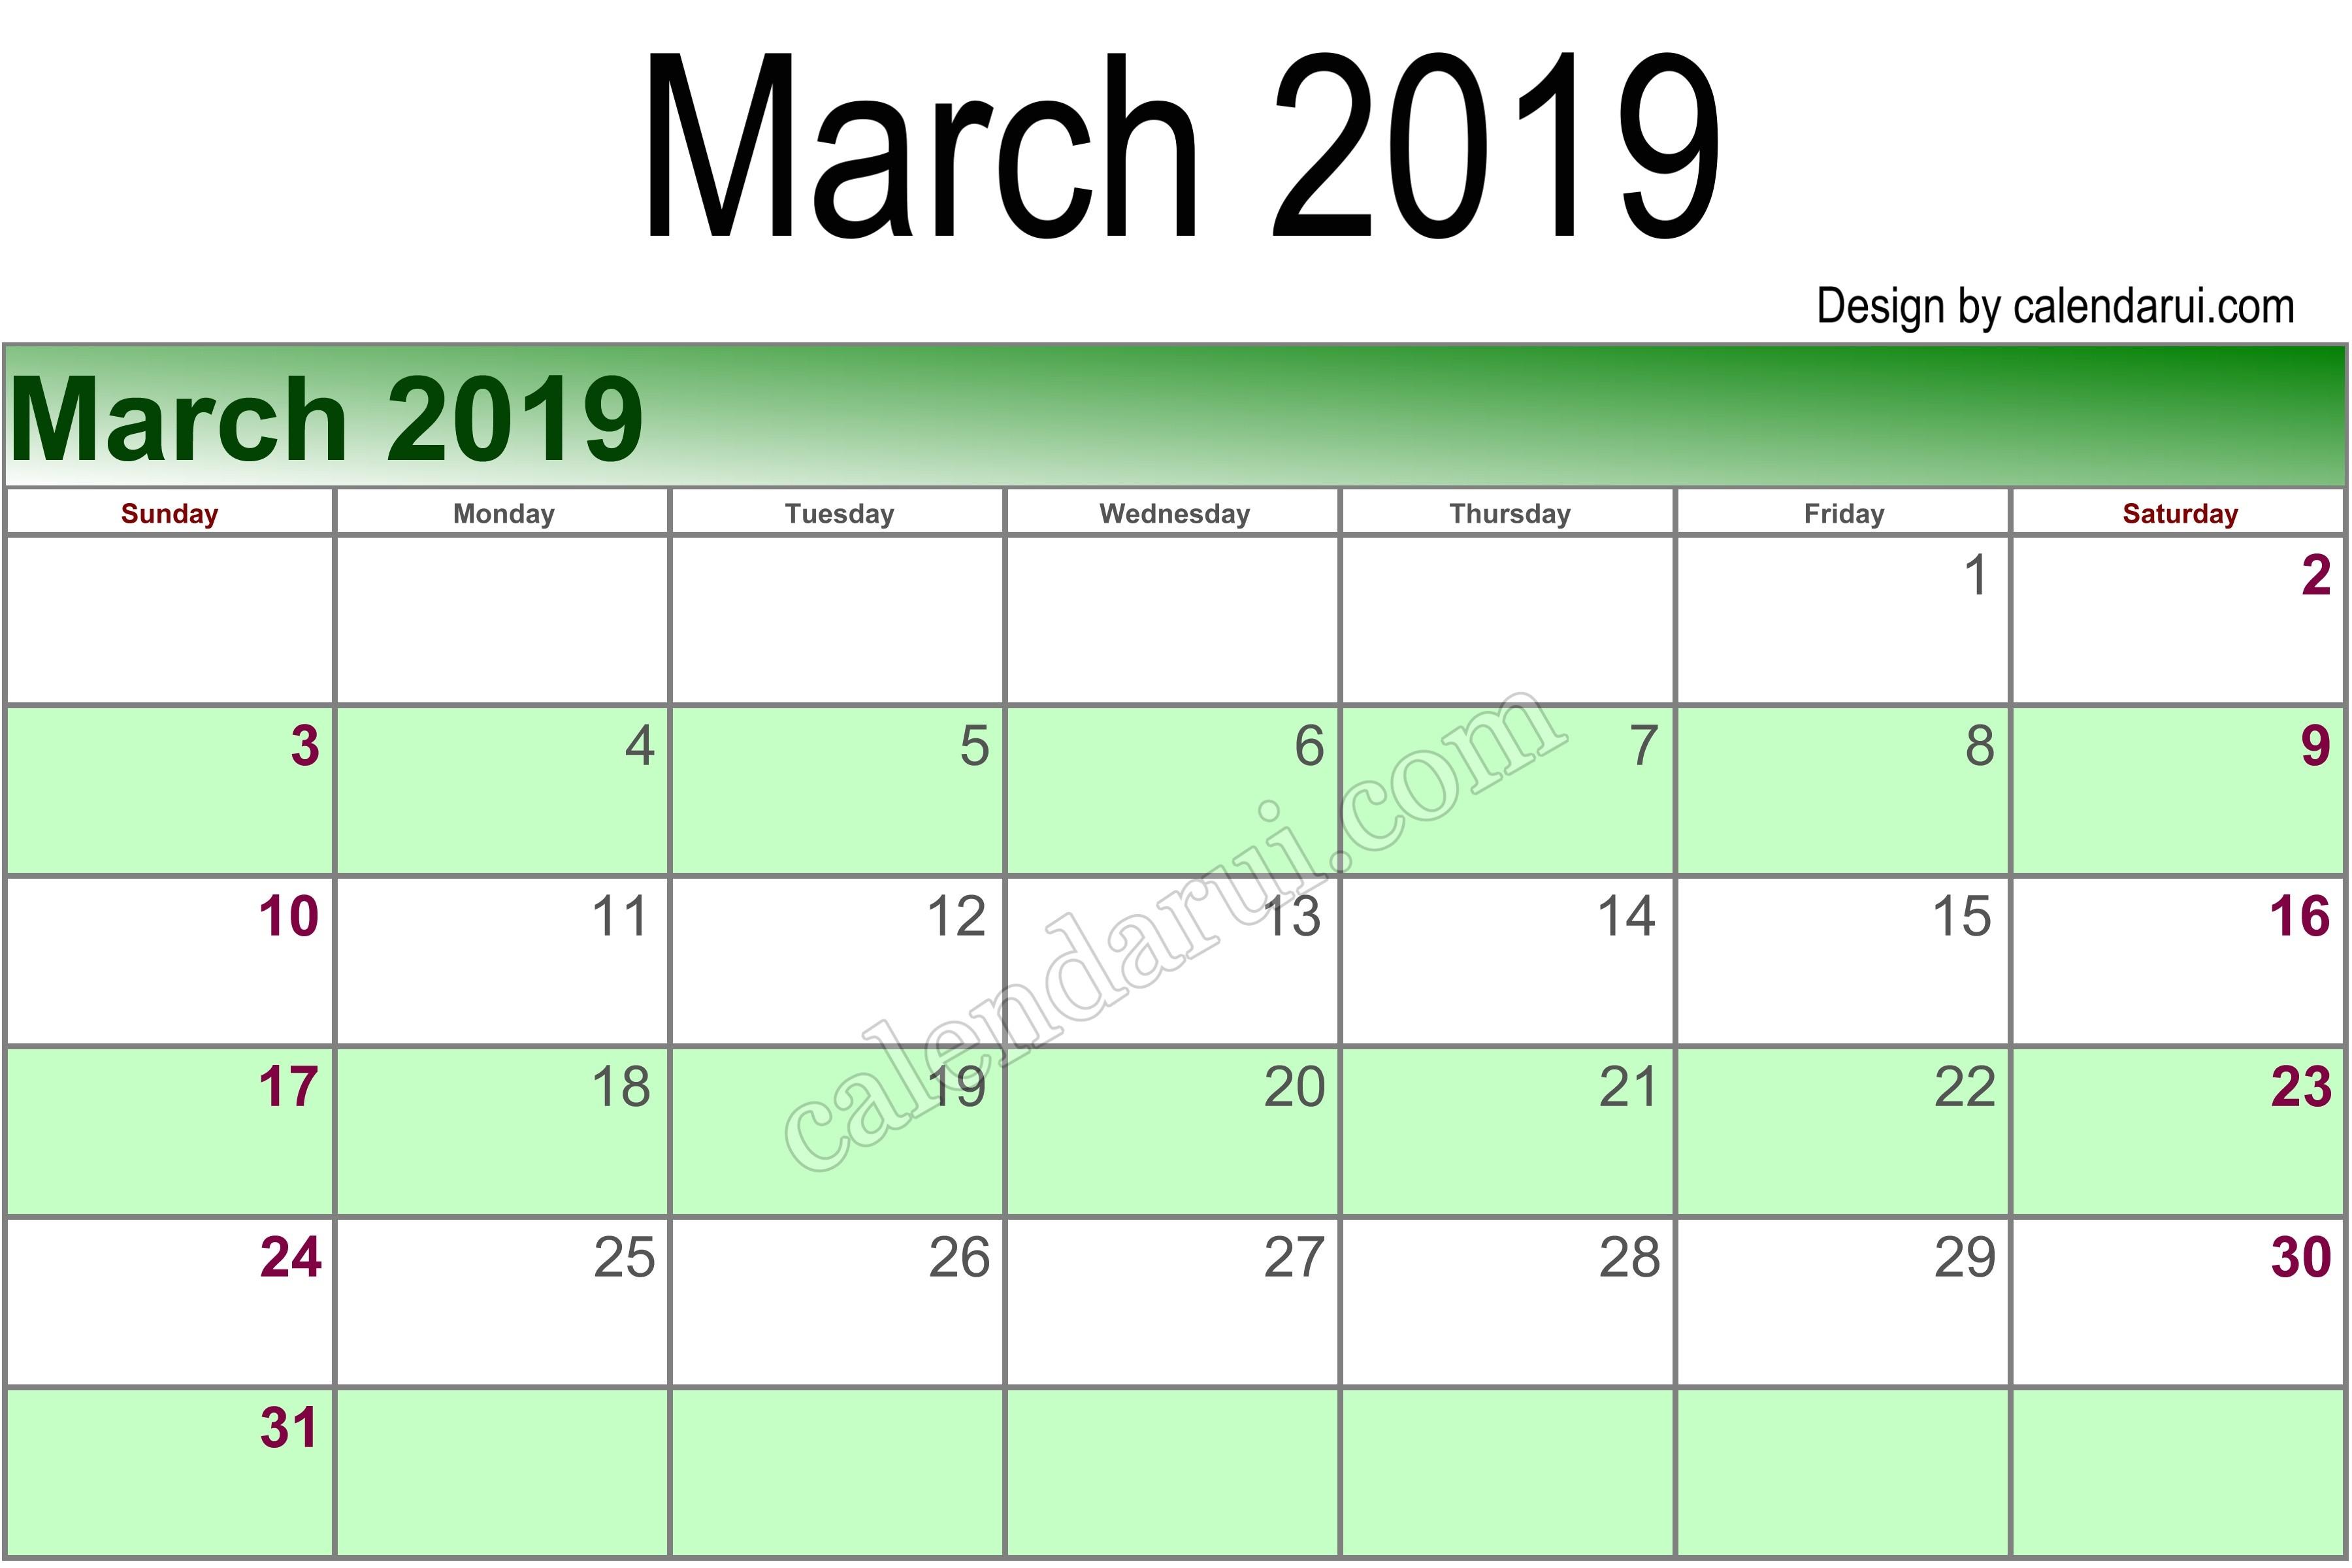 March Calendar 2019 Más Recientes Of March Calendar 2019 Template Rock Cafe Of March Calendar 2019 Mejores Y Más Novedosos 30 Day Calendar Template Awesome Calendar 1 April 2018 to 31 March